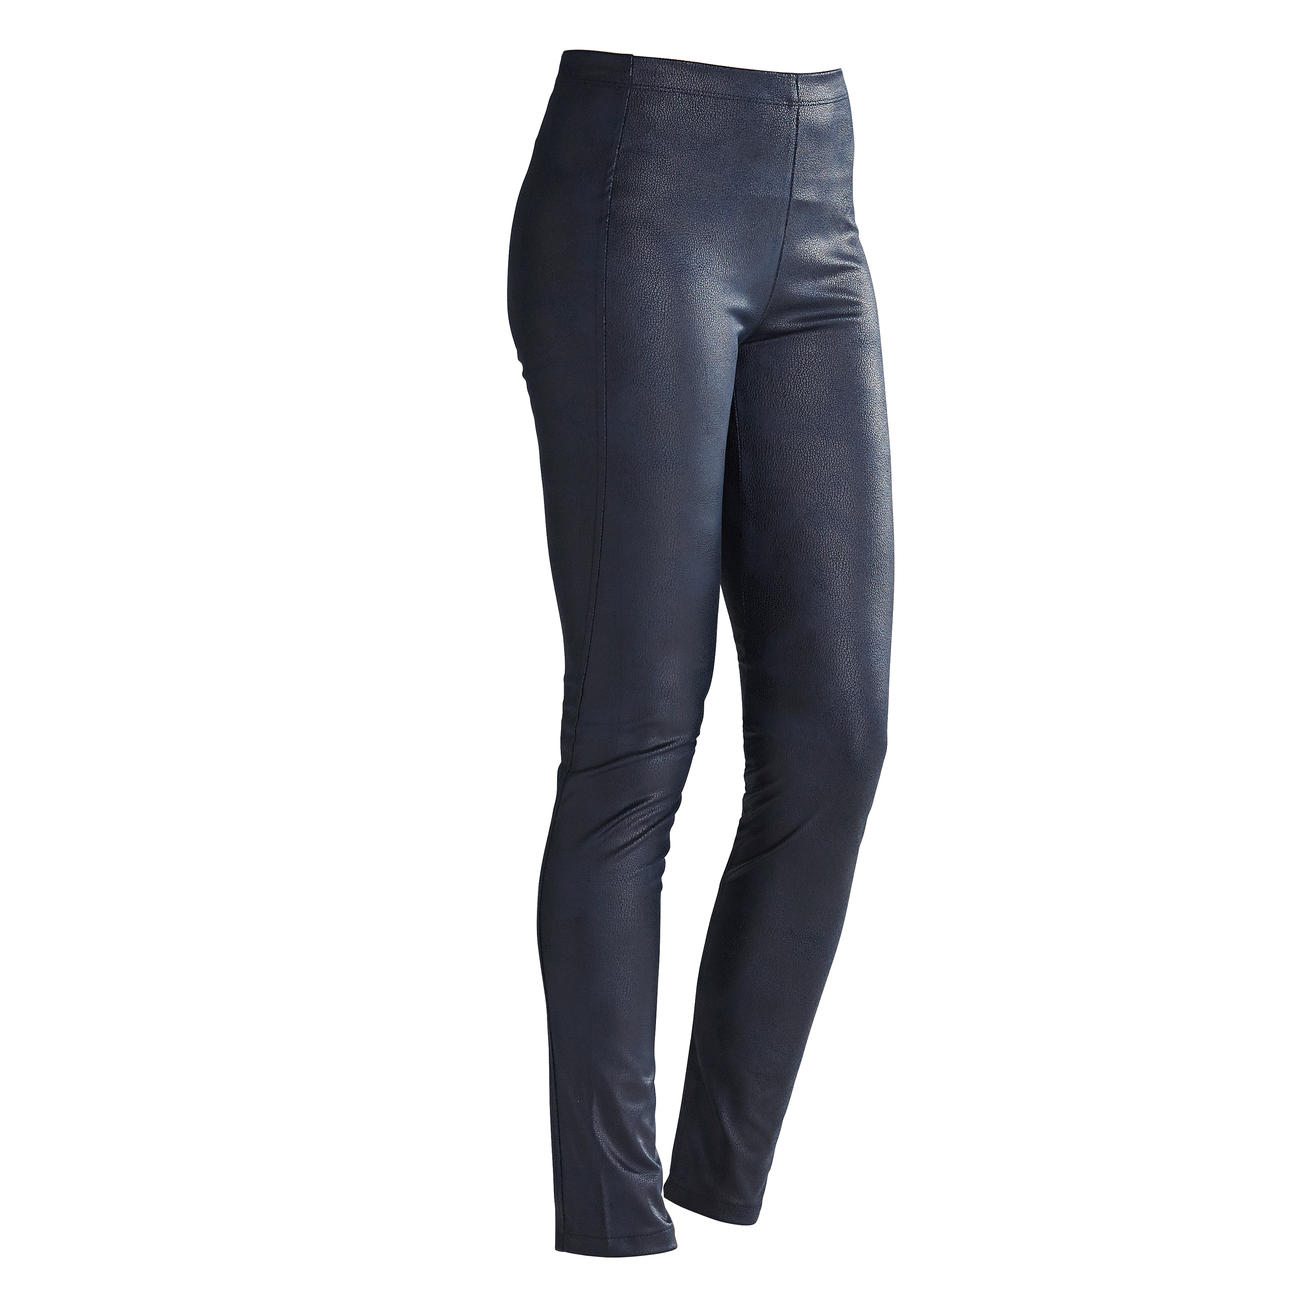 janice jo leggings faux cuir klassiker entdecken. Black Bedroom Furniture Sets. Home Design Ideas